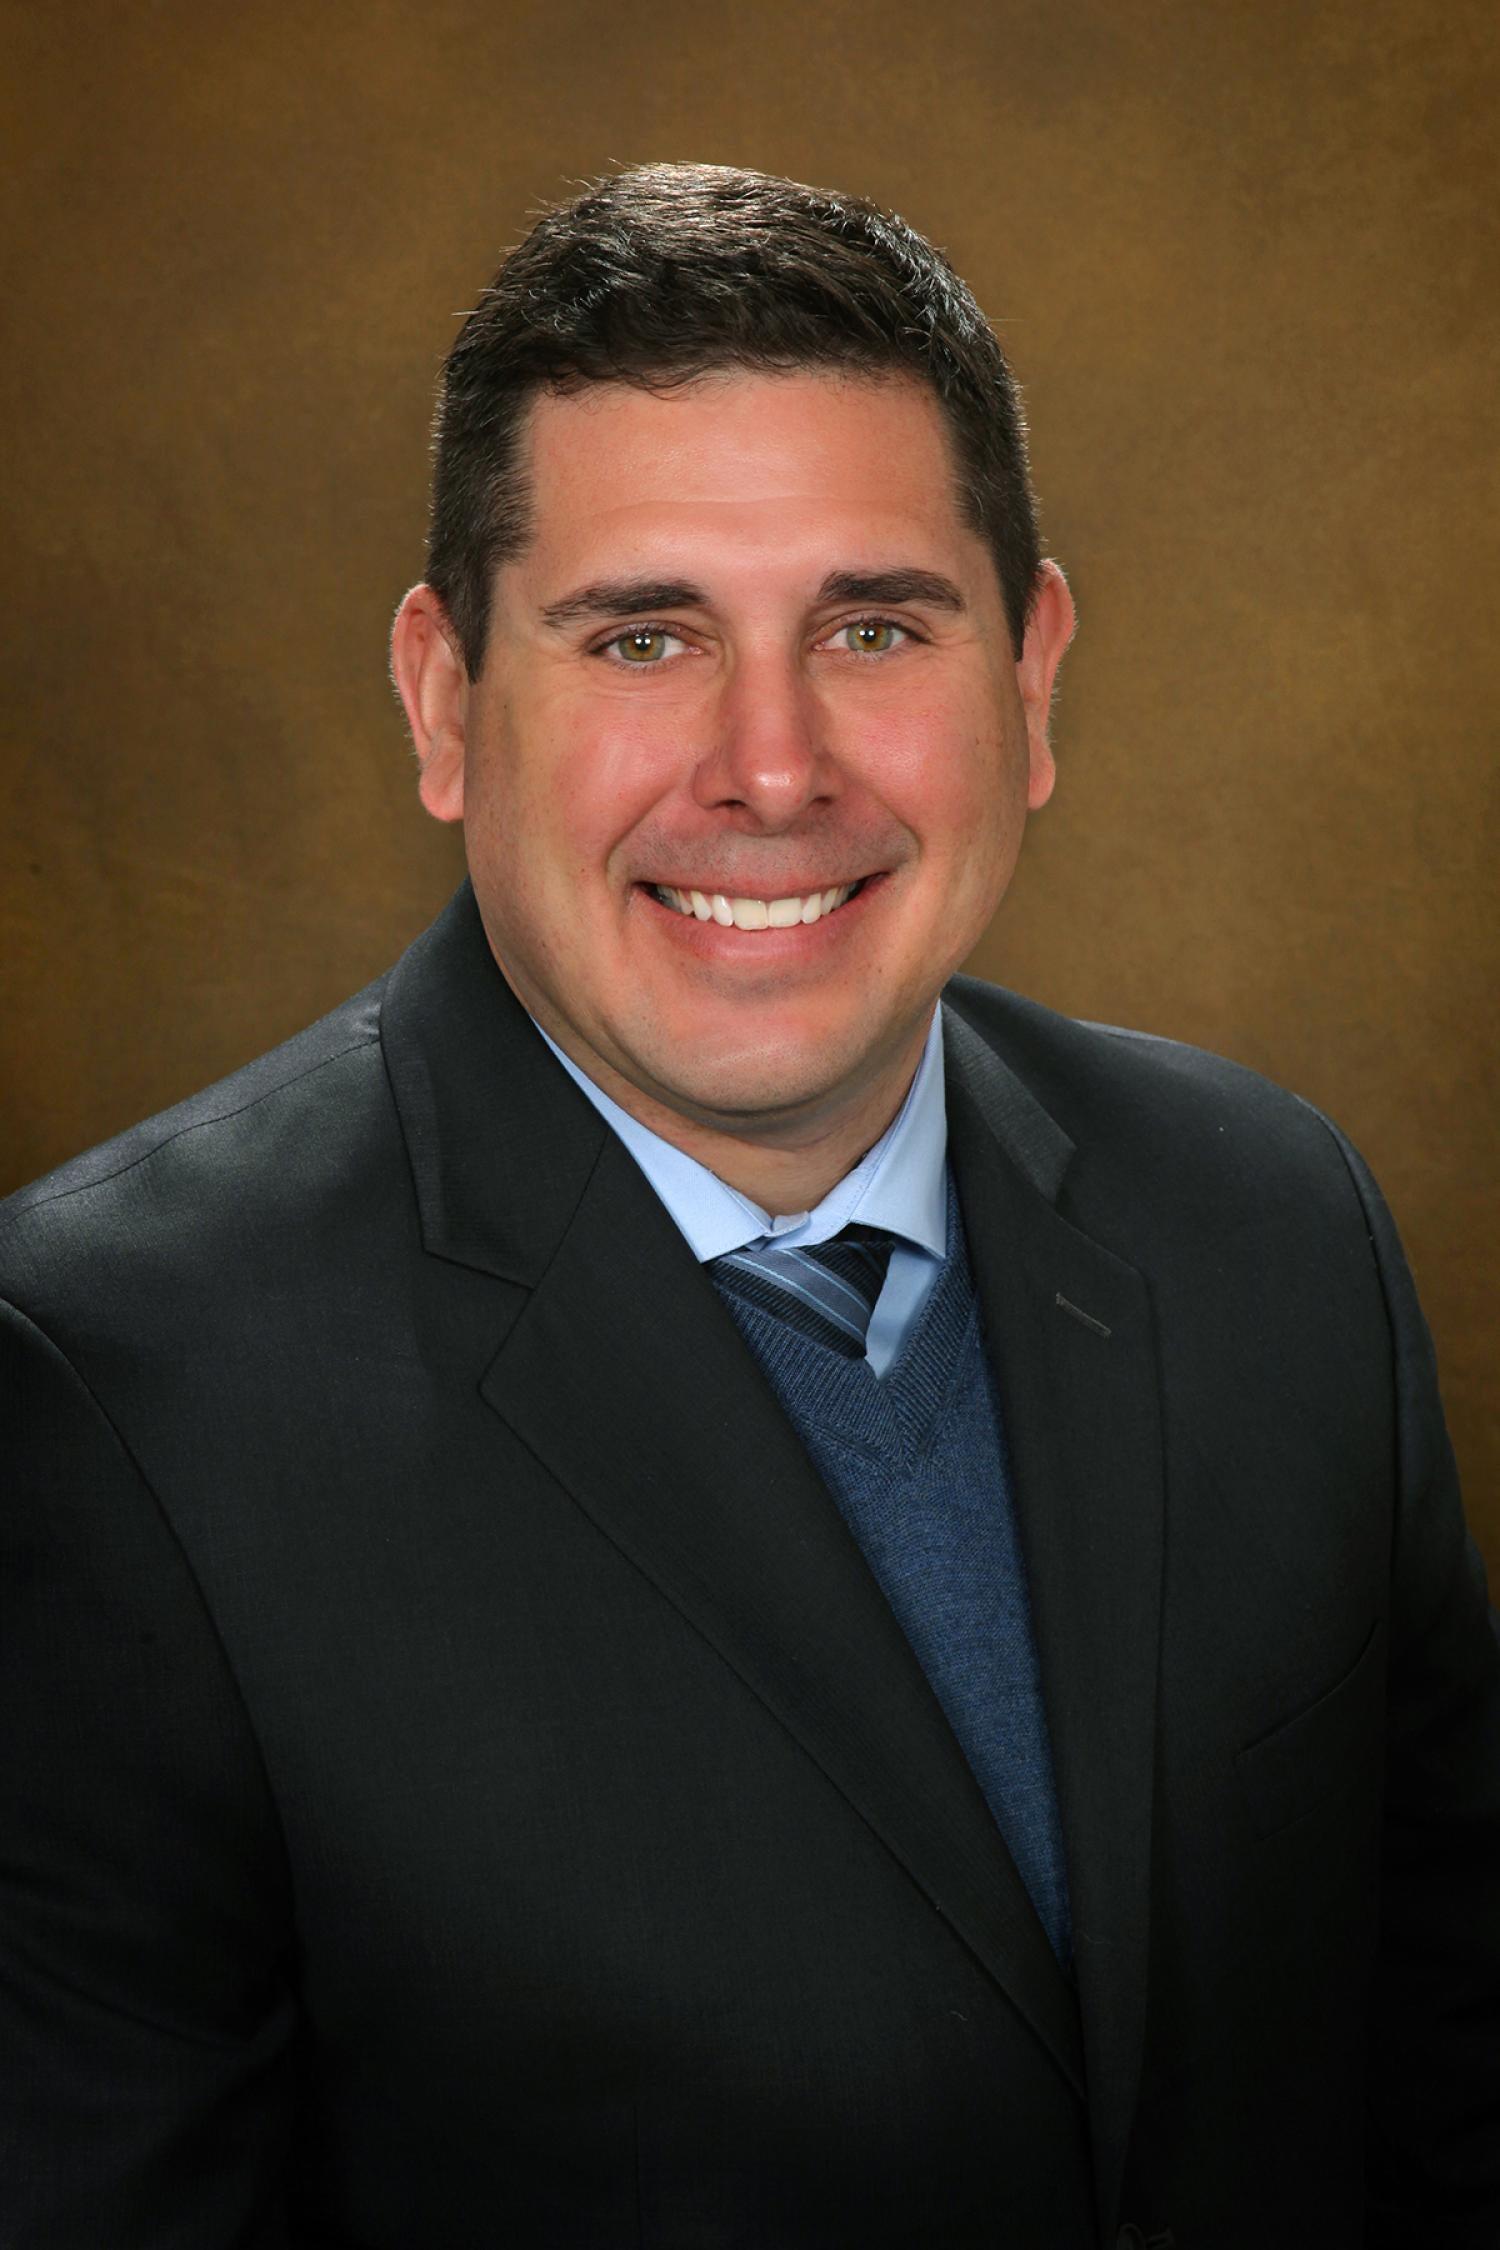 Mike Turman